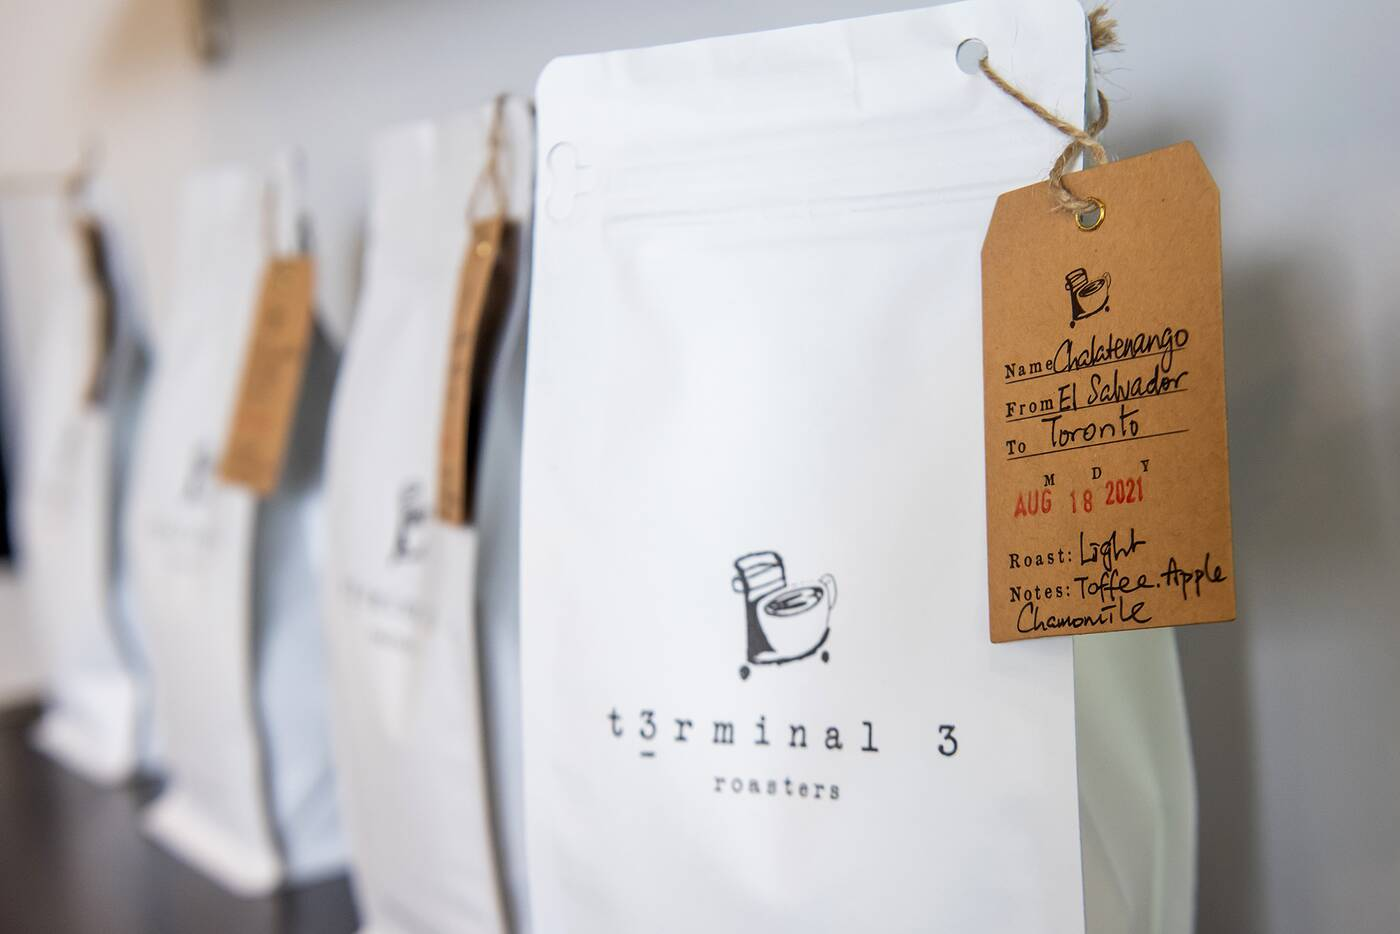 terminal 3 coffee toronto